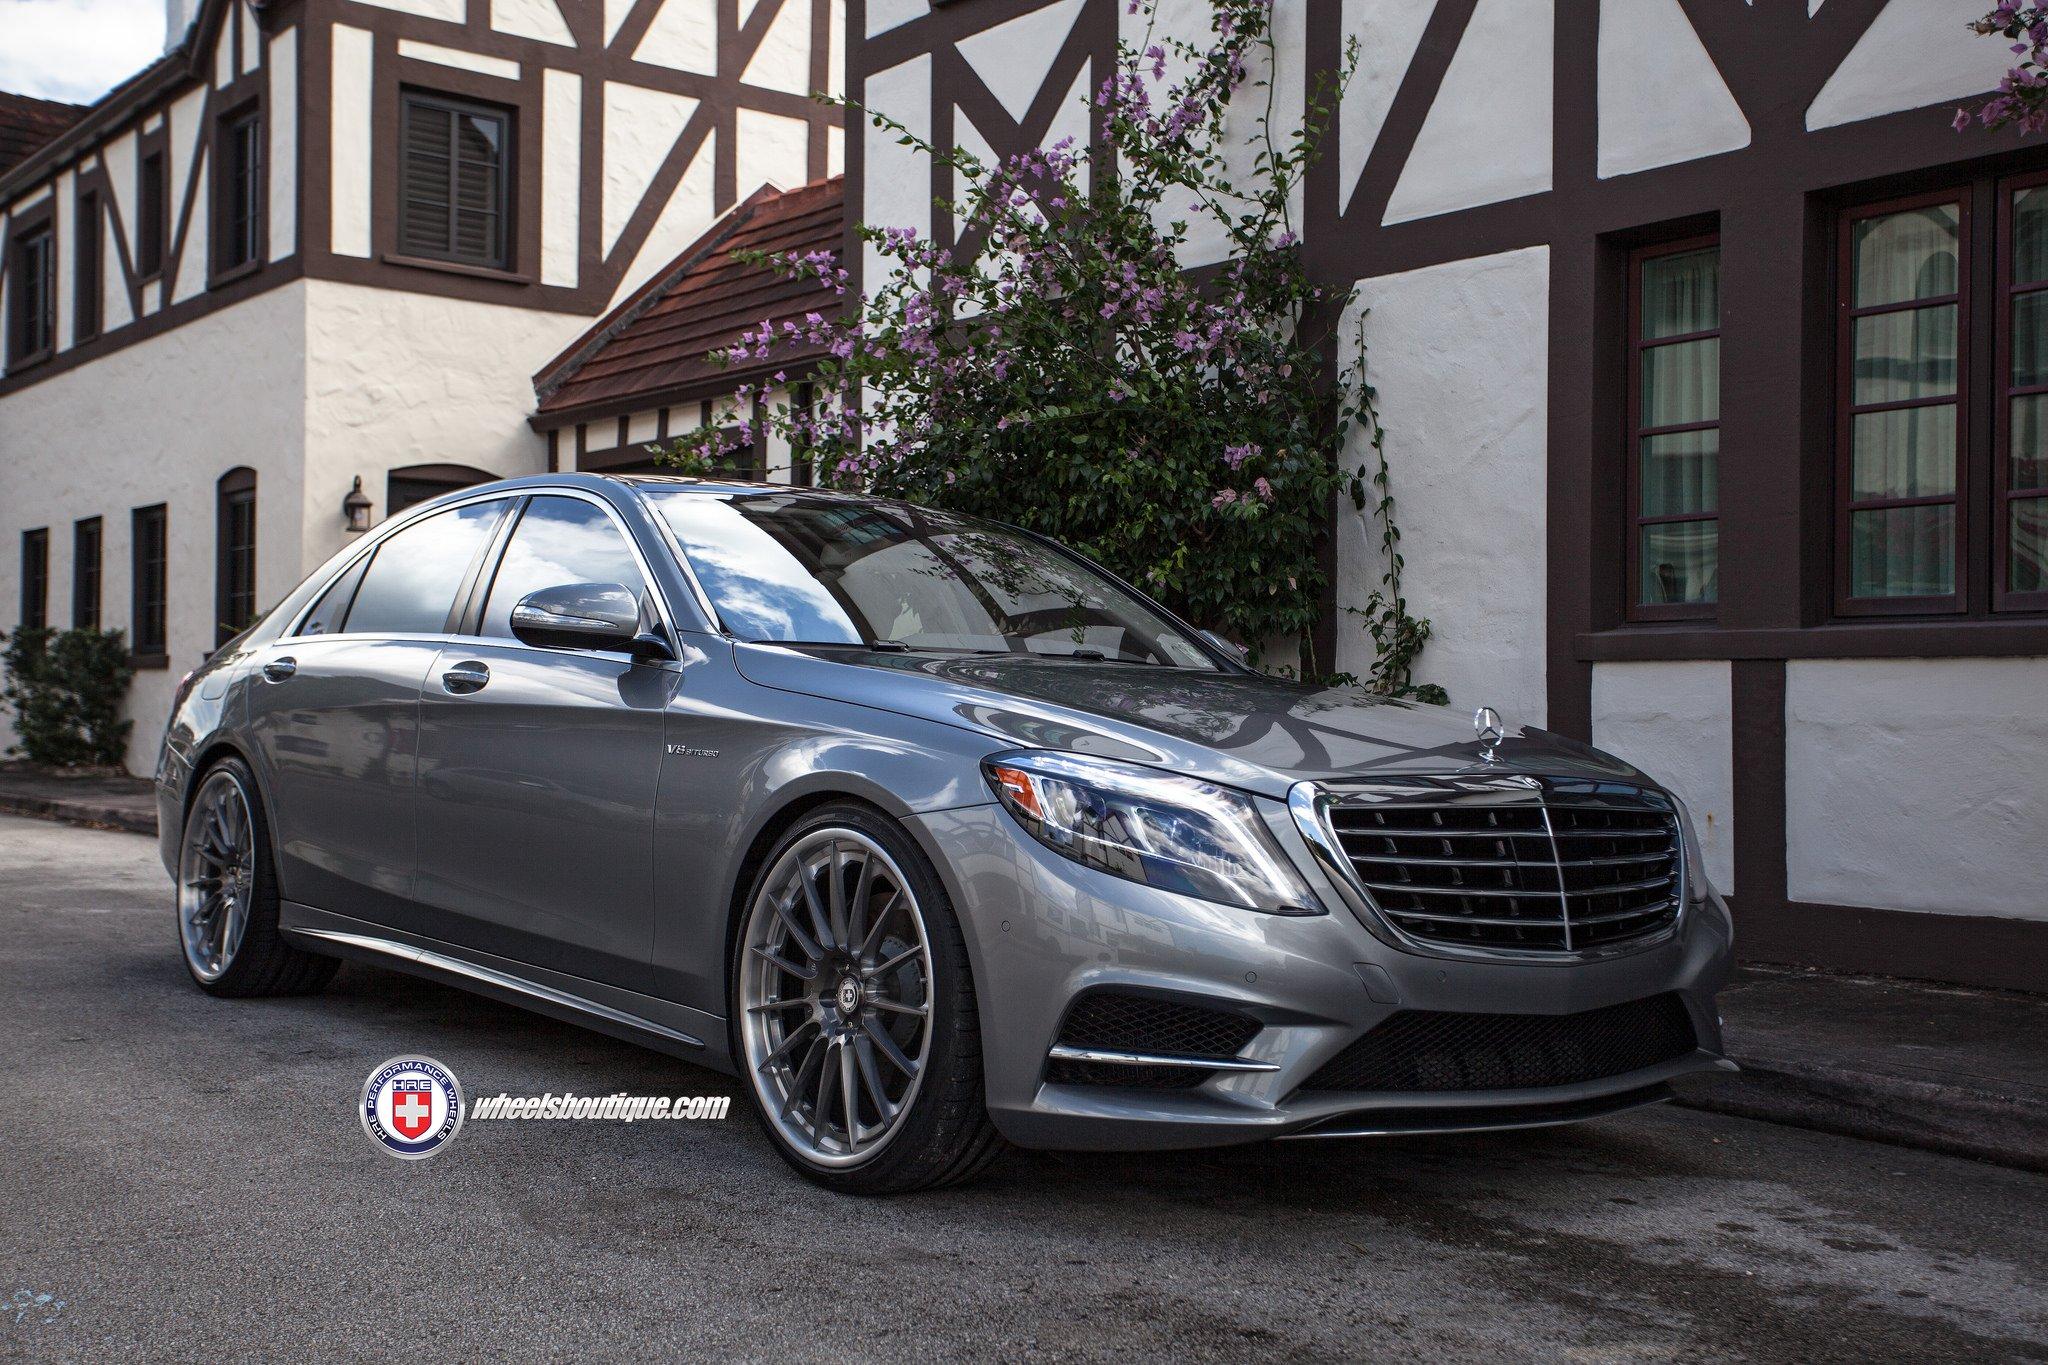 2015 991 cars hre mercedes s550 tuning wheels wallpaper for Rims mercedes benz